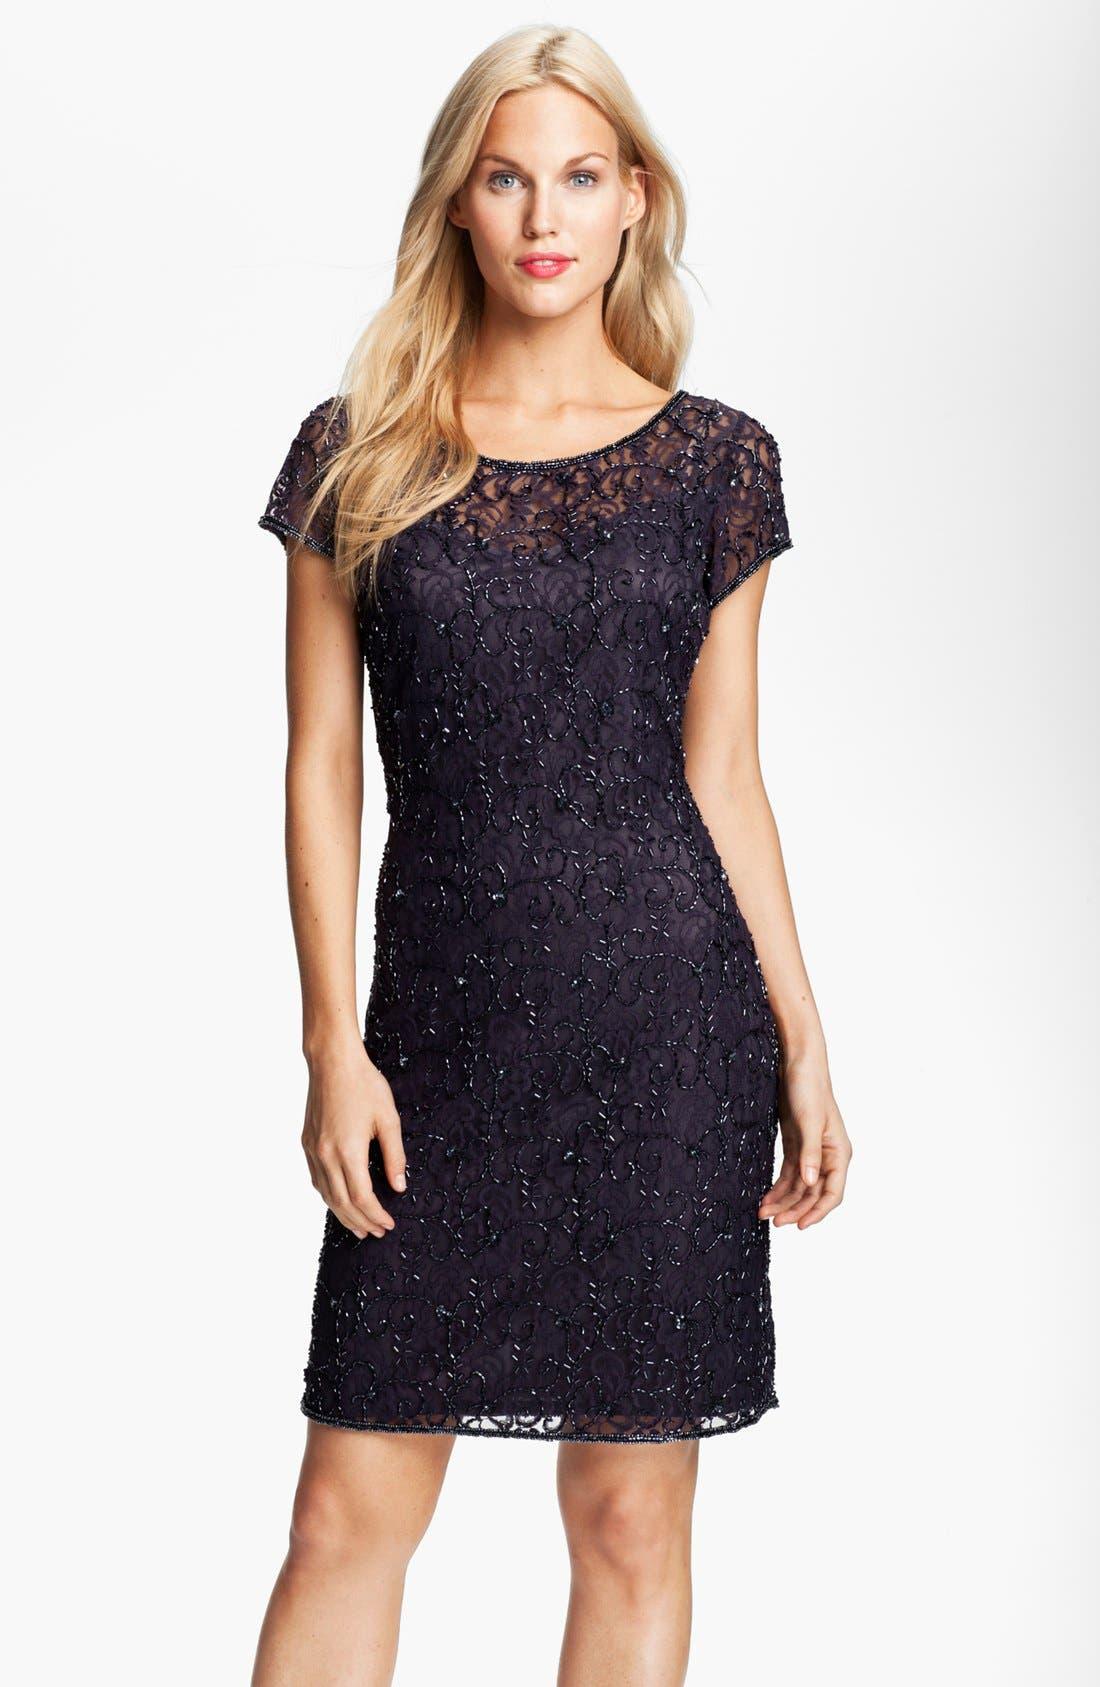 Alternate Image 1 Selected - Pisarro Nights Beaded Lace Sheath Dress (Petite)